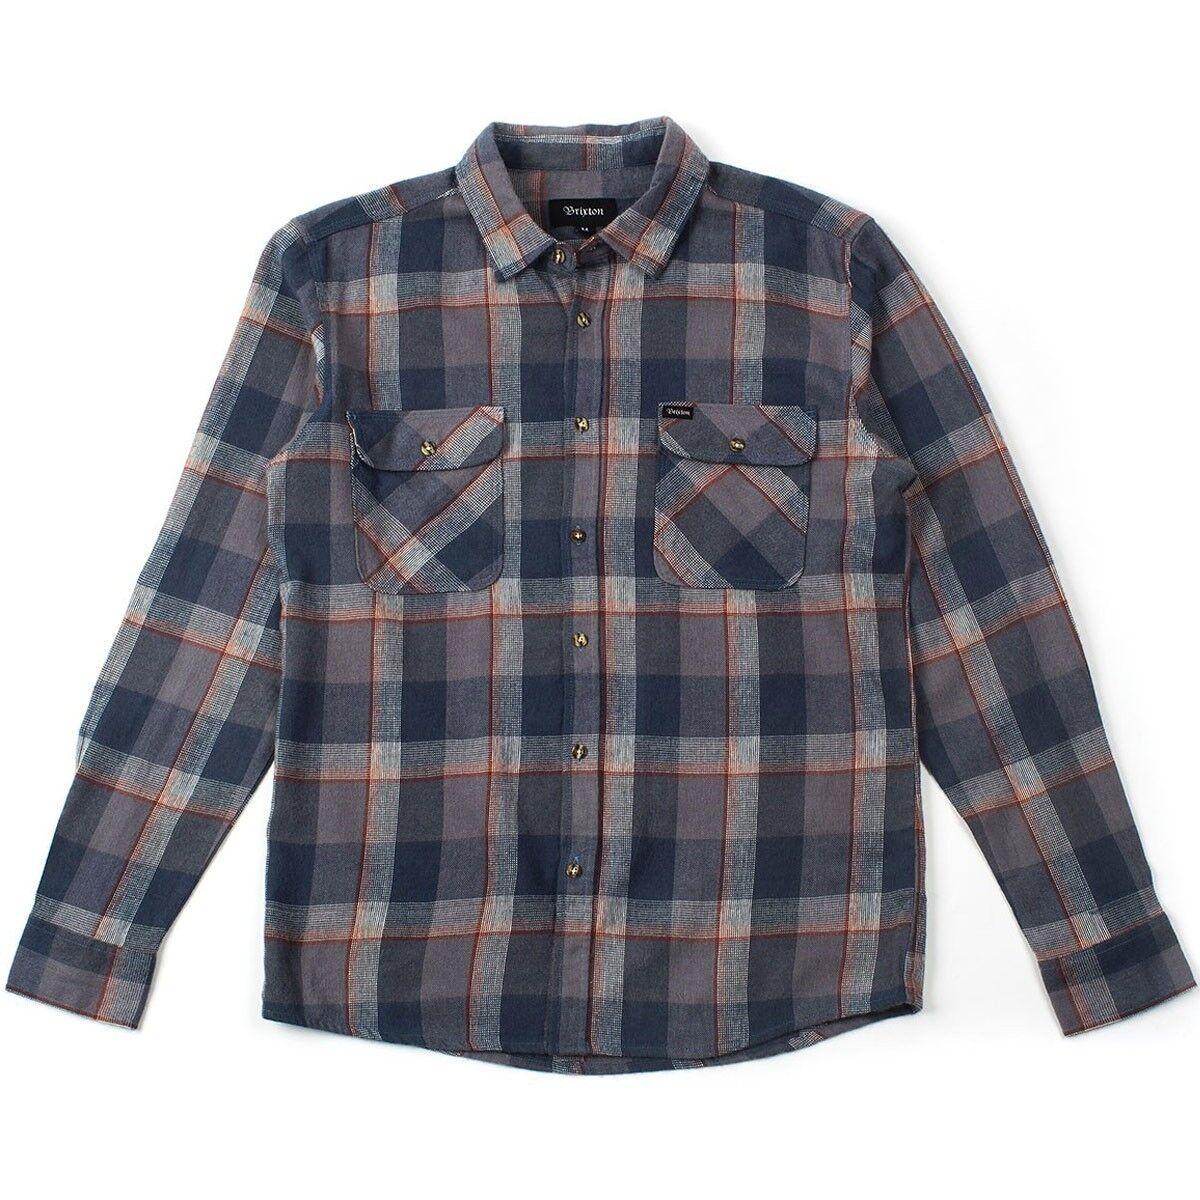 Brixton BOWERY bluee Slate Rust Plaid L S Flannel Button Down Men's Shirt